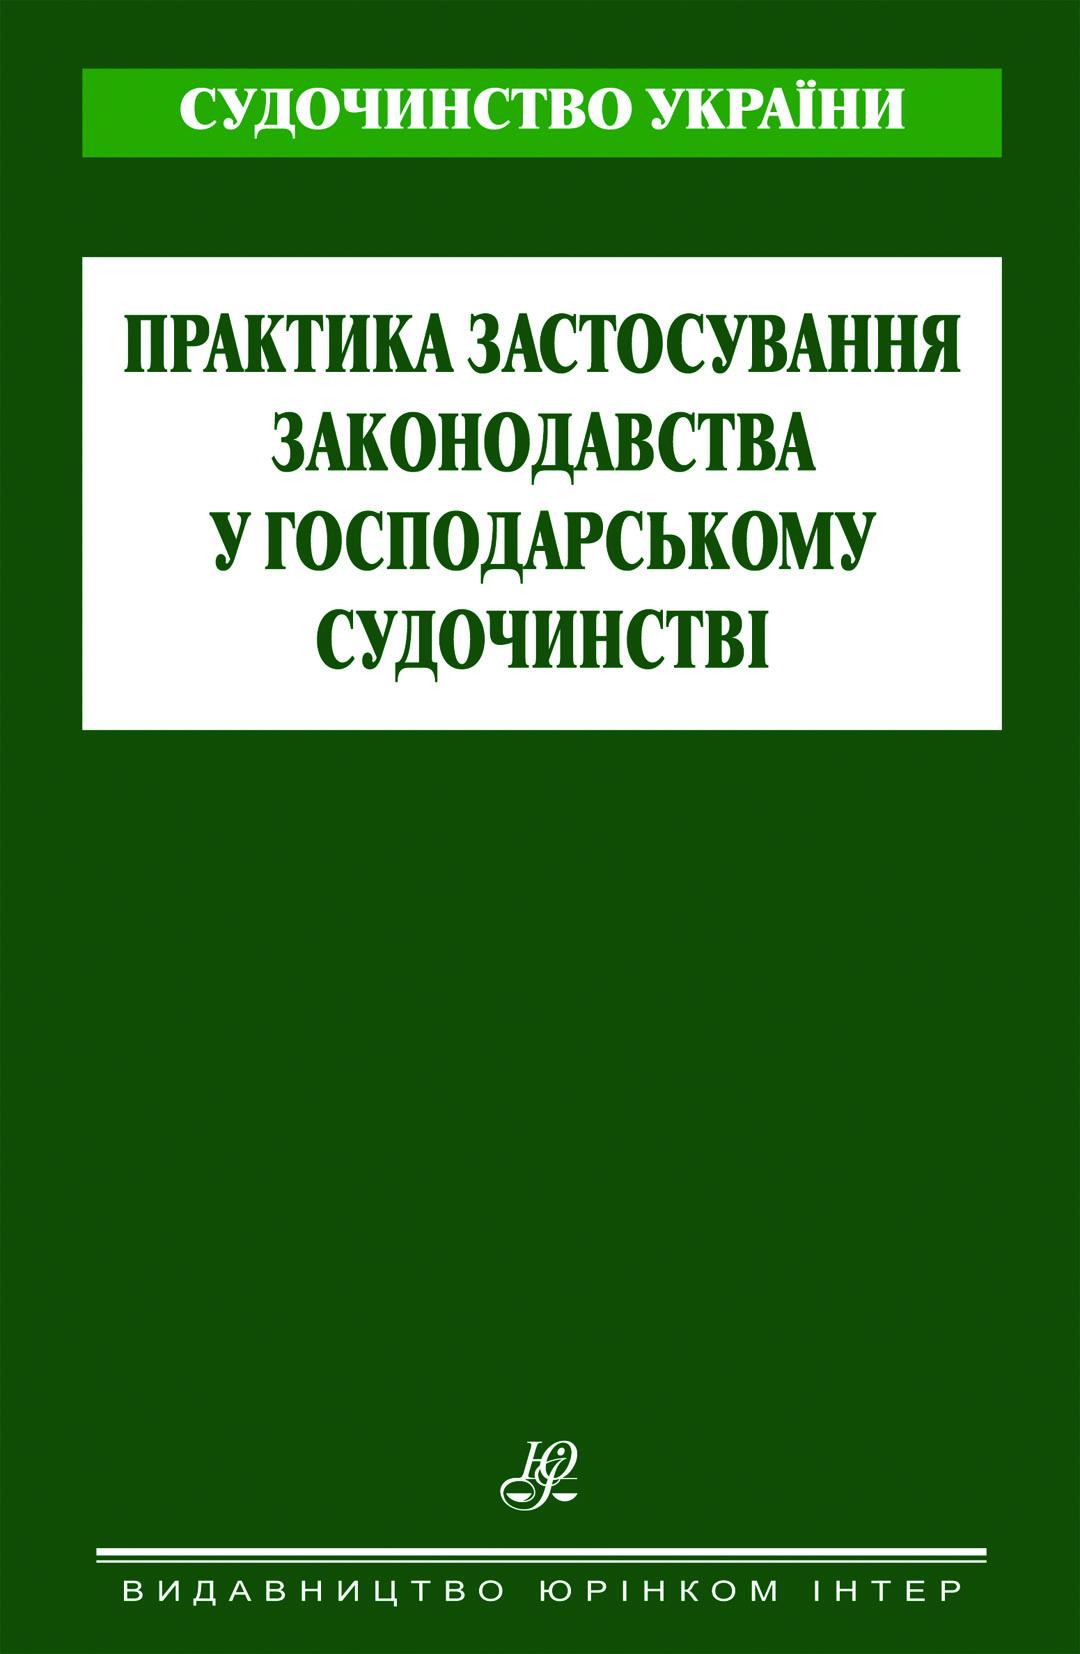 Обложка книги Практика застосування господарського судочинства